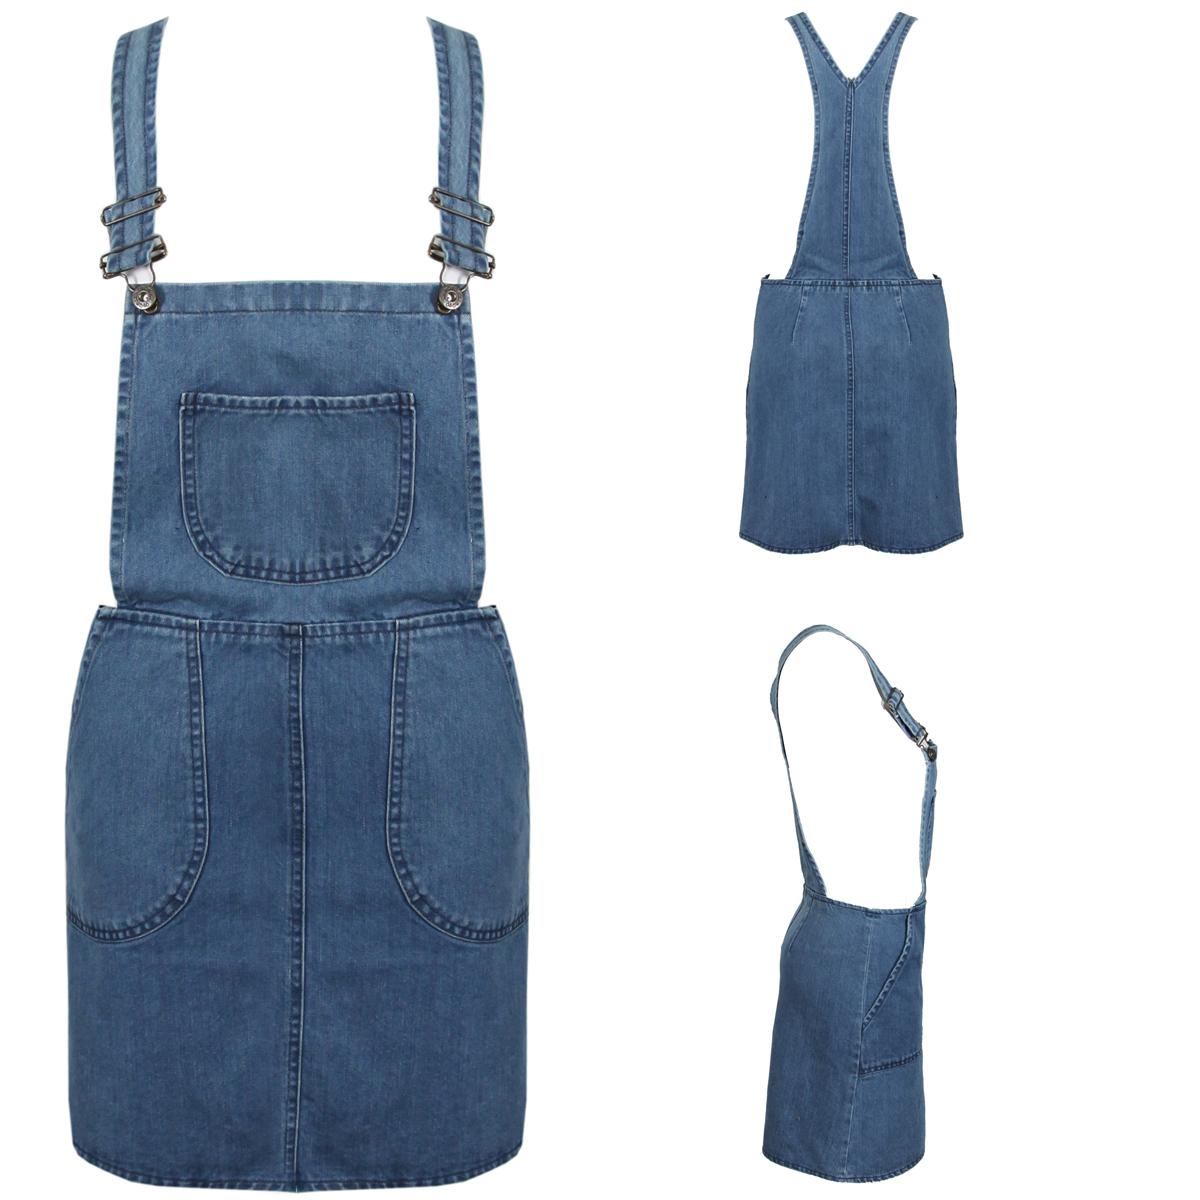 NEW-WOMENS-BLUE-SHIFT-DENIM-PINI-DRESS-BUCKLE-LADIES-DUNGAREE-SIZE-8-10-12-14